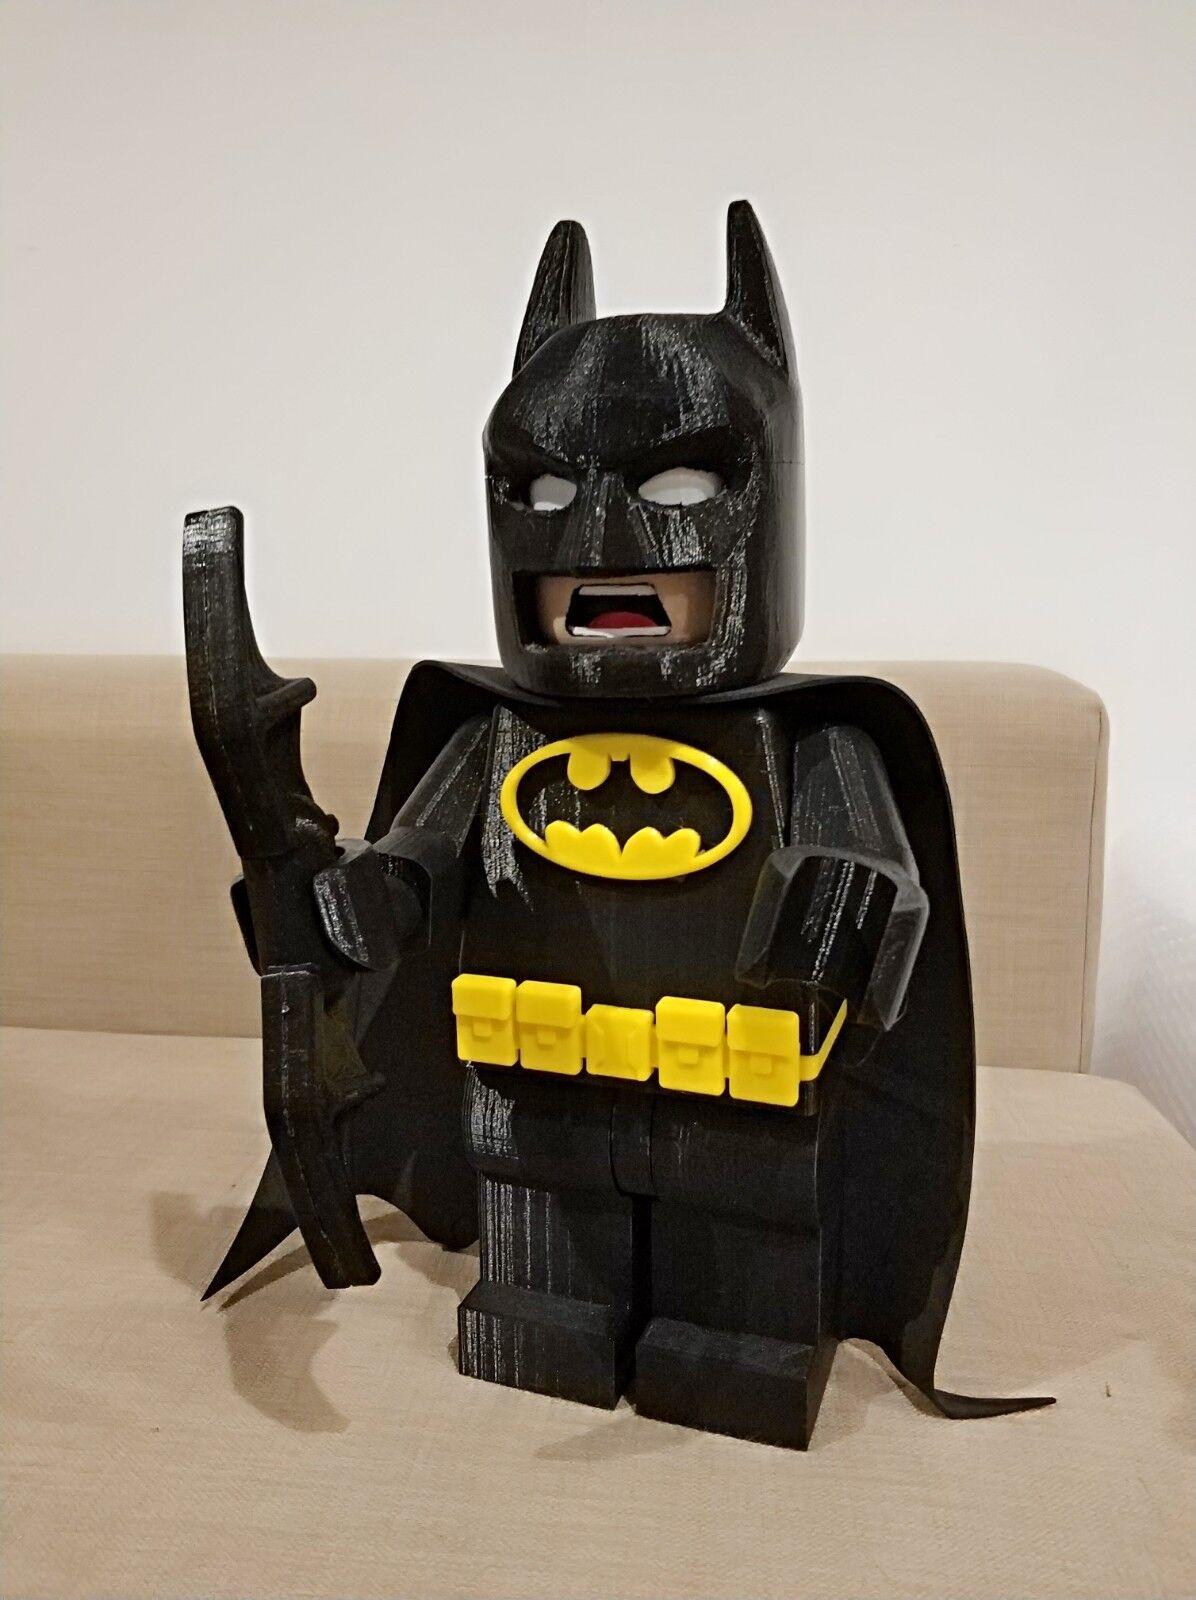 LEGO BATMAN GIGANTE XXXL 38cm